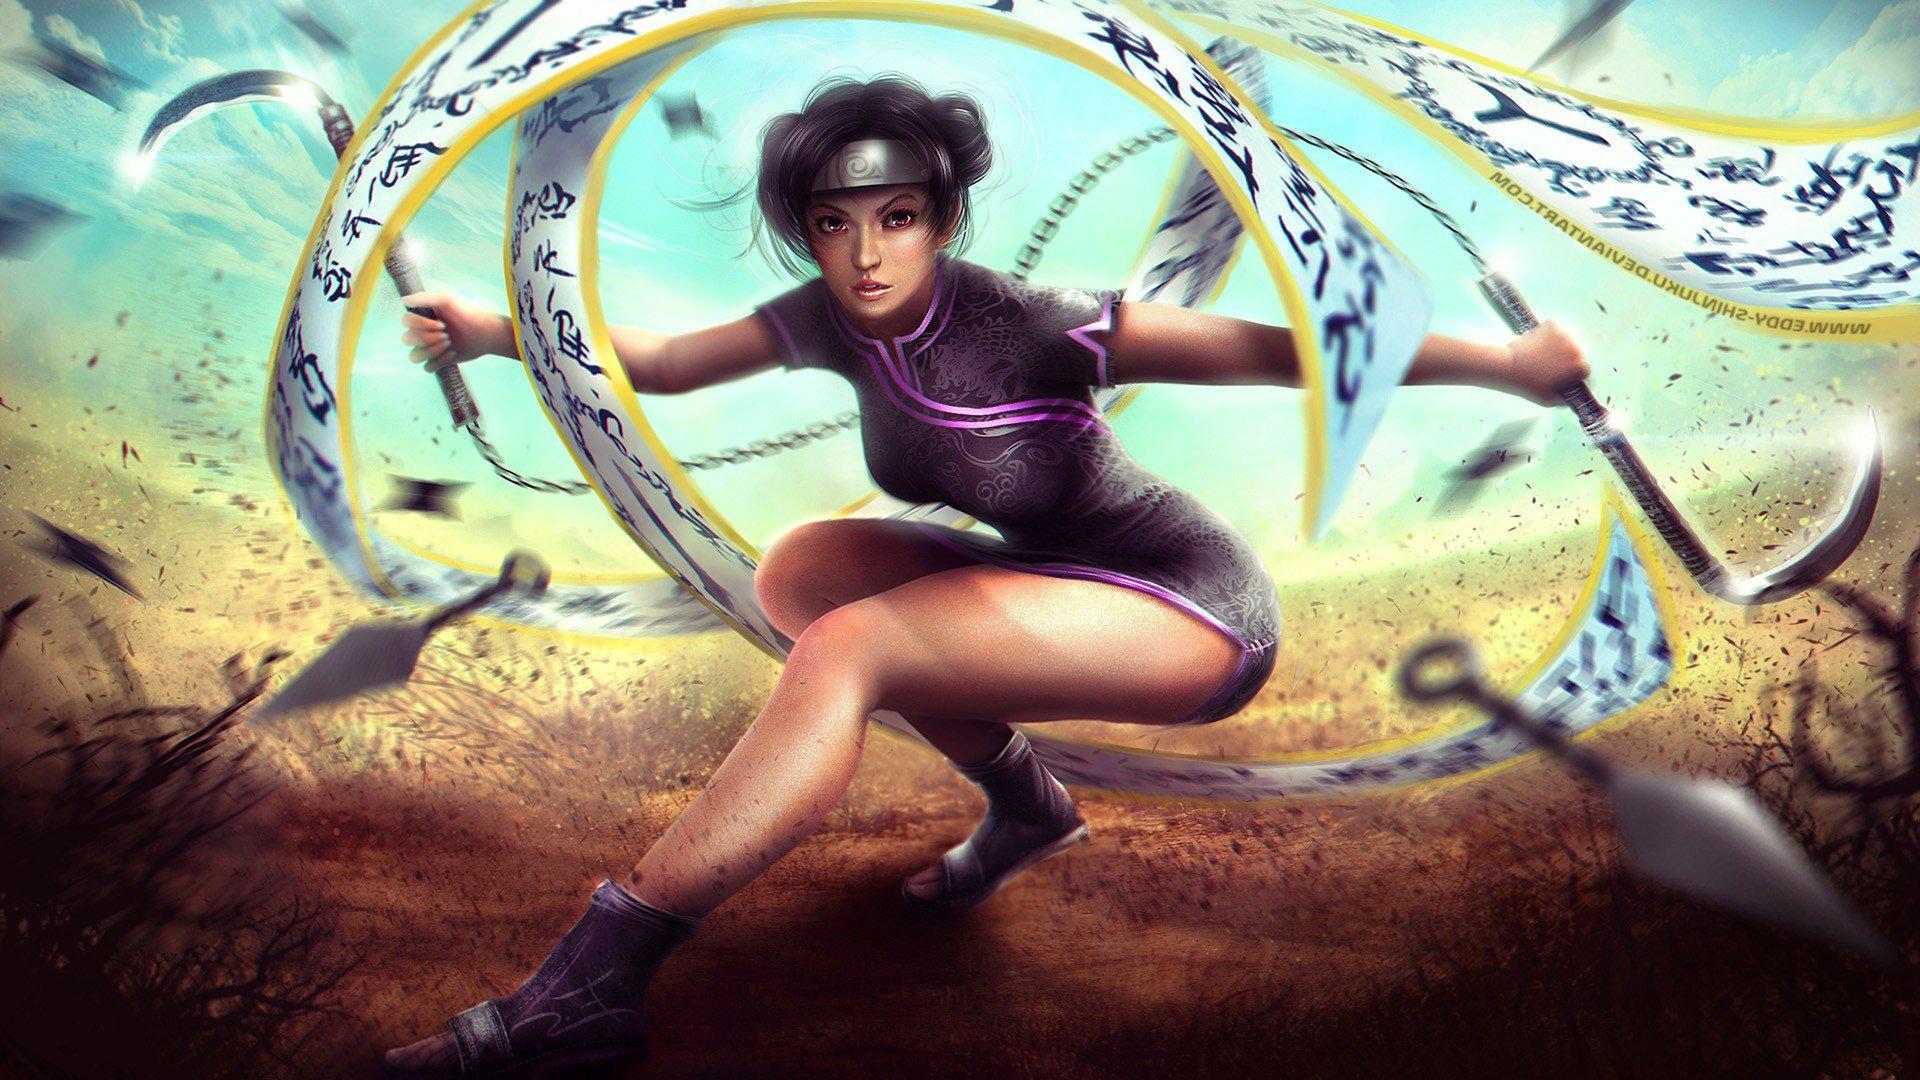 Tenten Naruto Shippuden Hd Fantasy Girls 4k Wallpapers Images